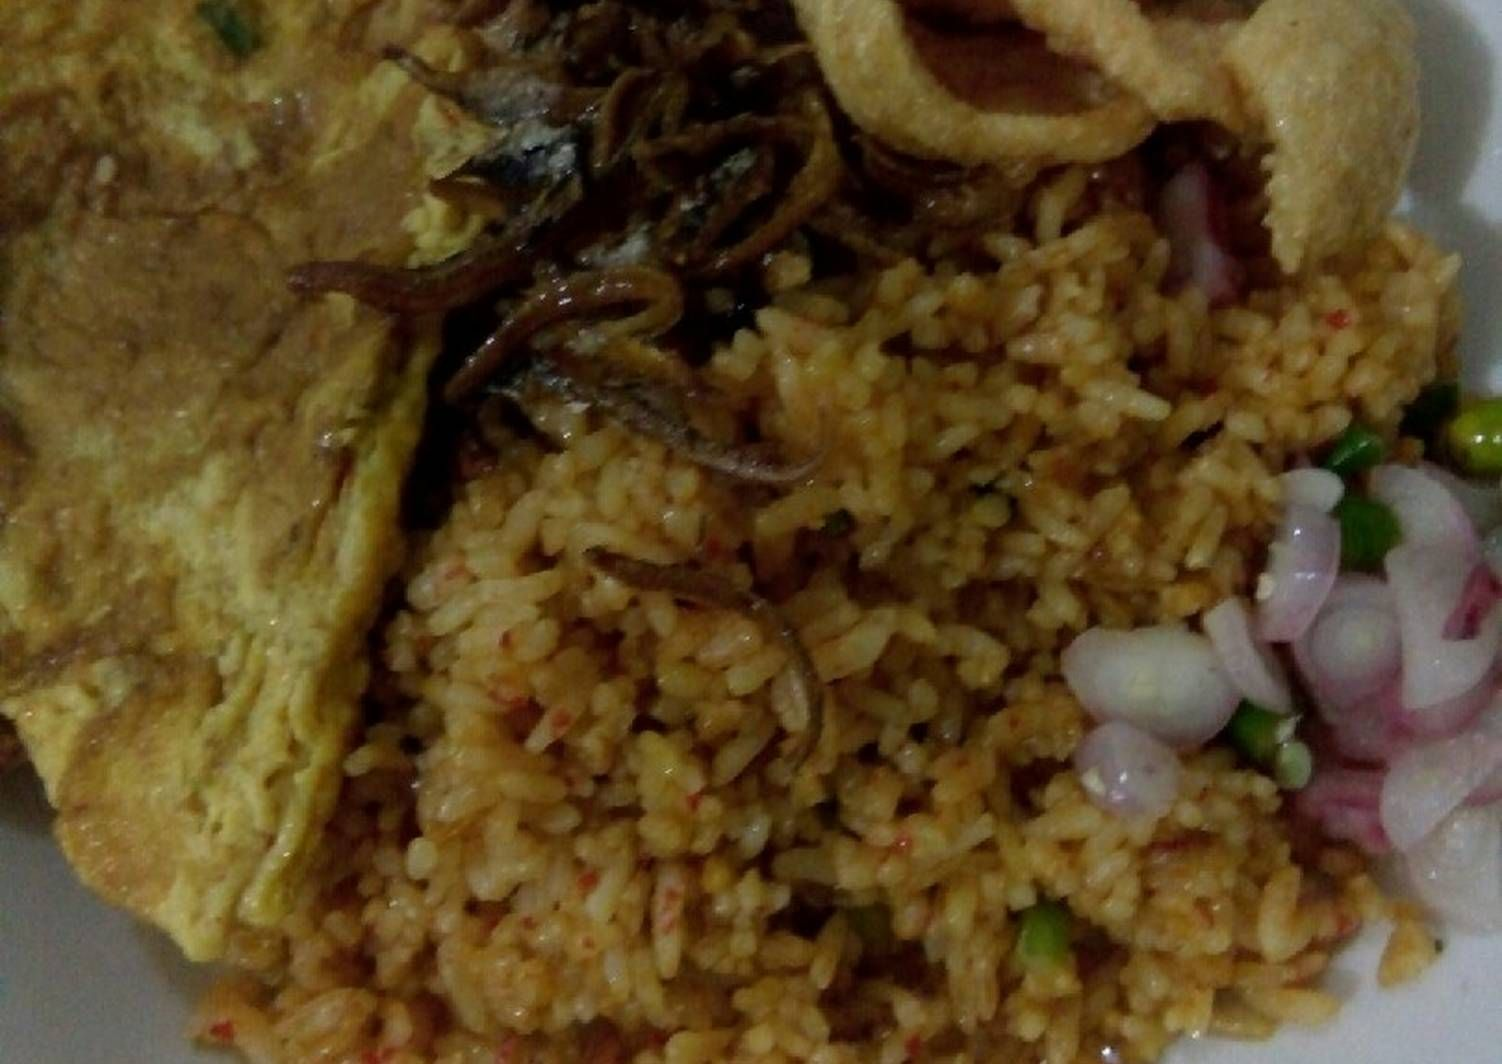 Resep Nasi Goreng Ala Kaki Lima Oleh Srihadi Yanti Resep Makanan Nasi Goreng Resep